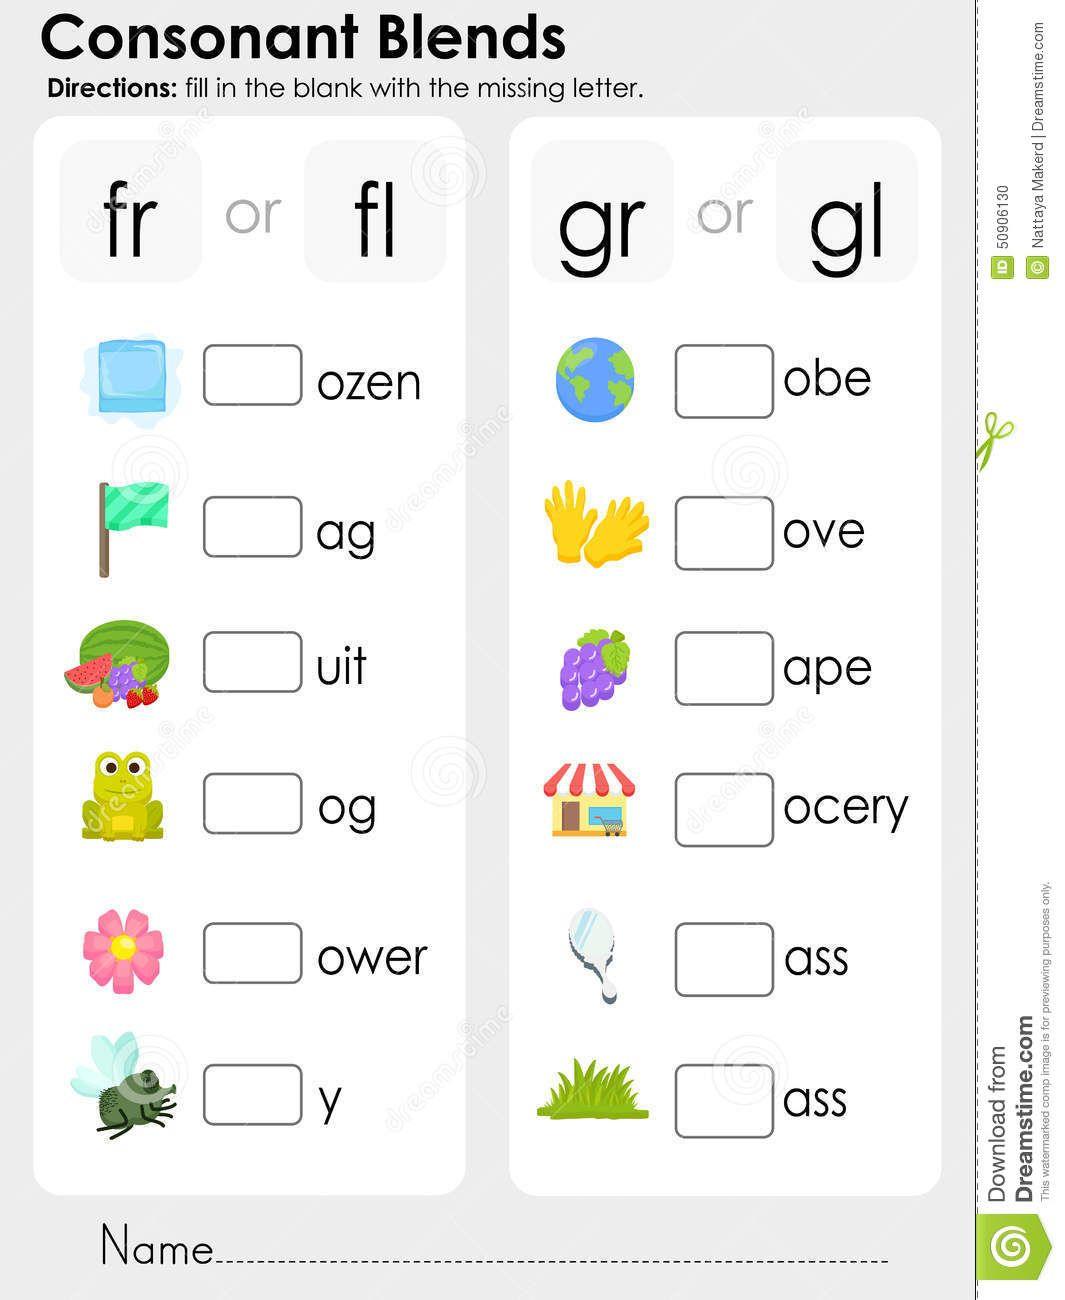 Consonant Blends : Missing Letter - Worksheet For Education with regard to Letter Blends Worksheets